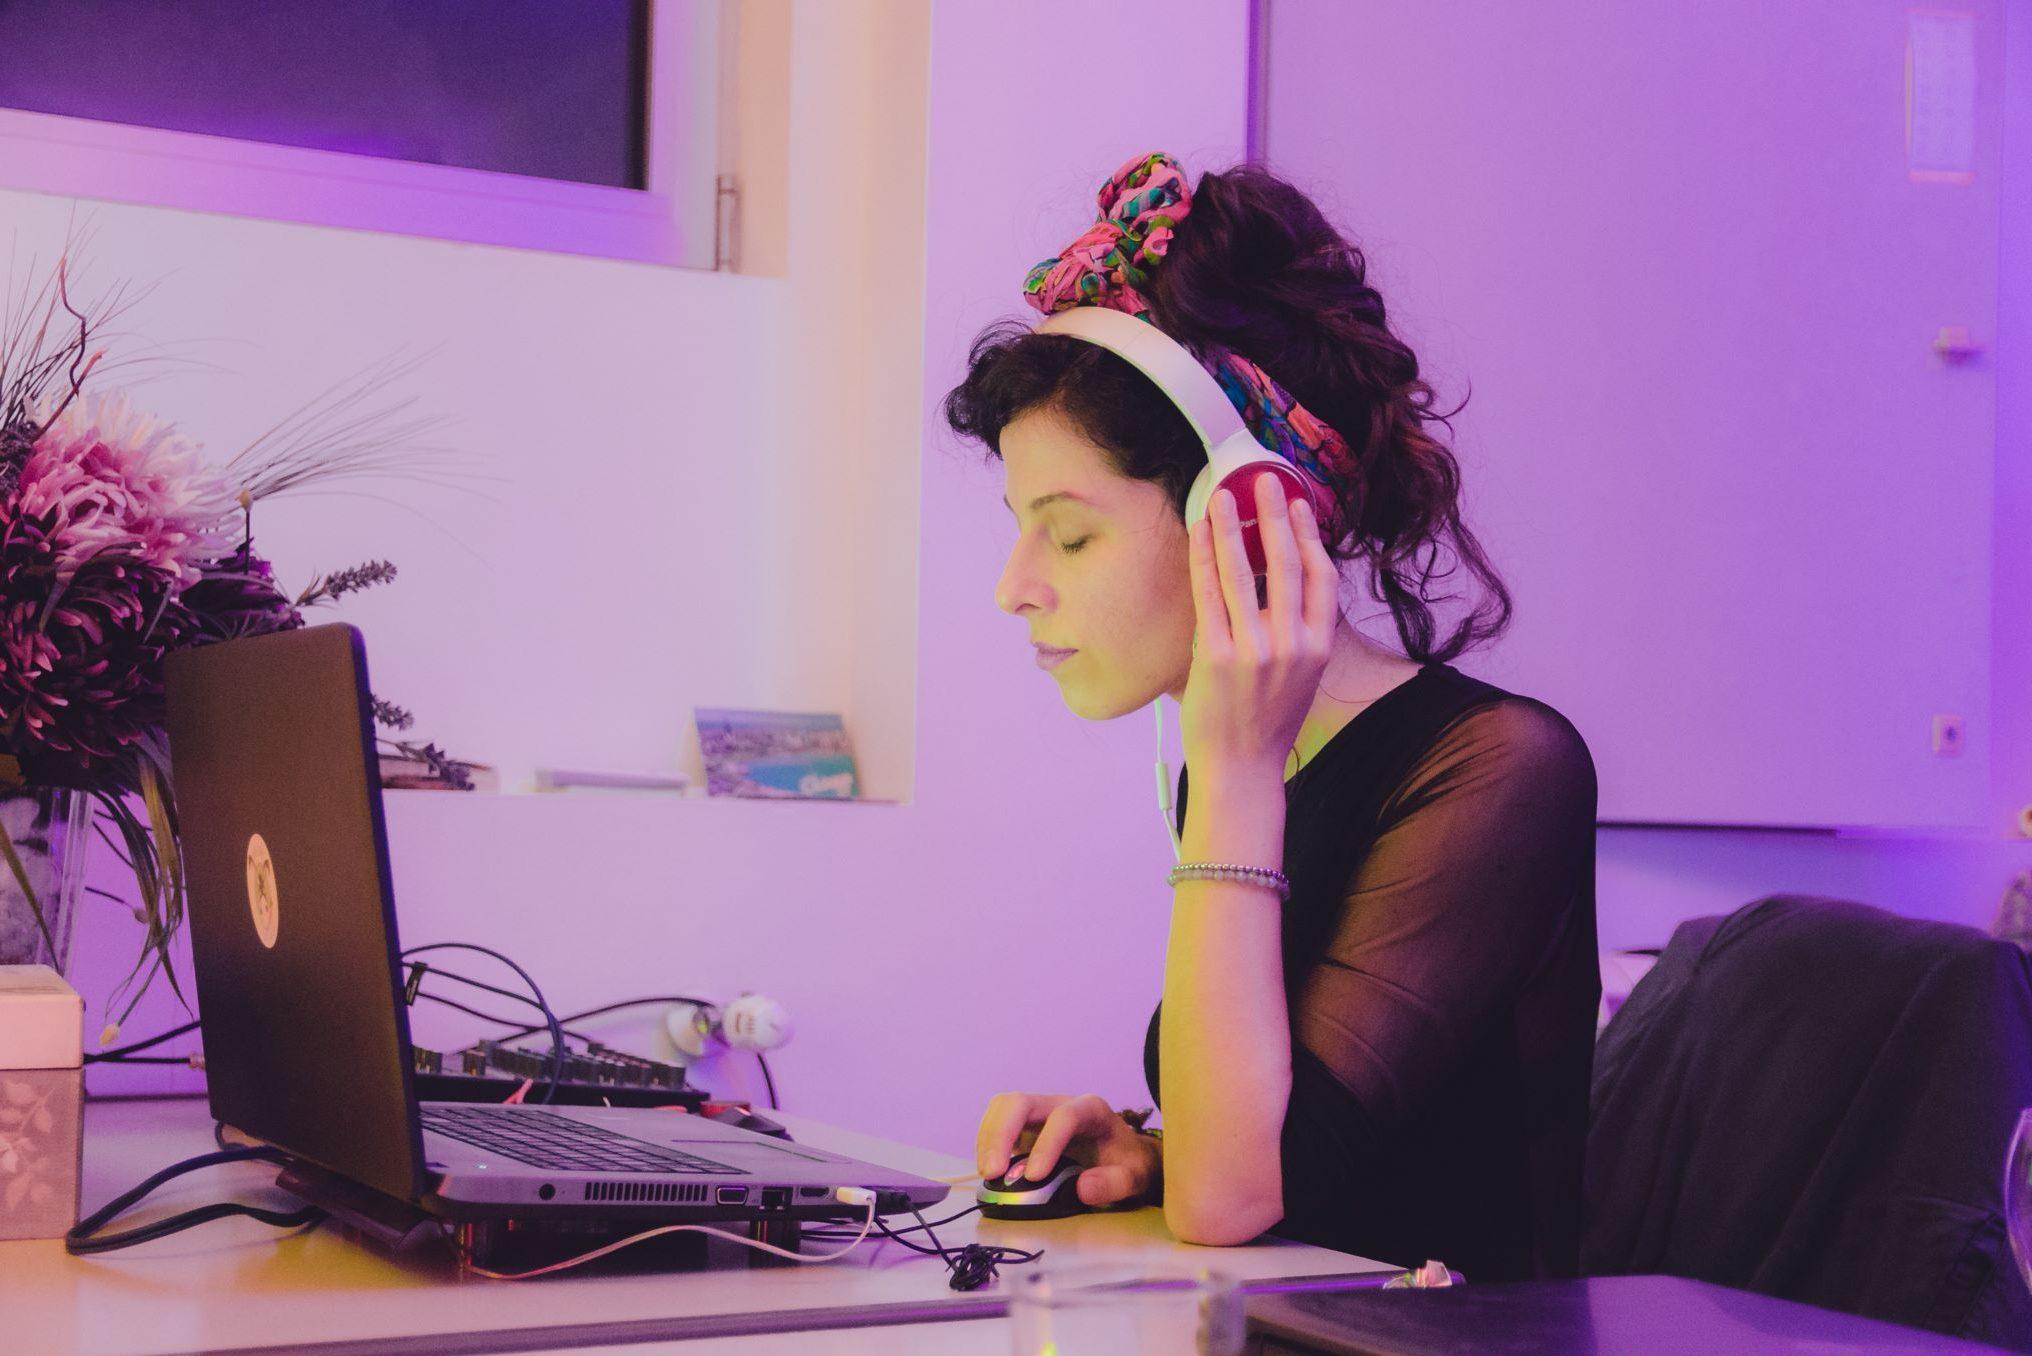 DJ djurdjina 2